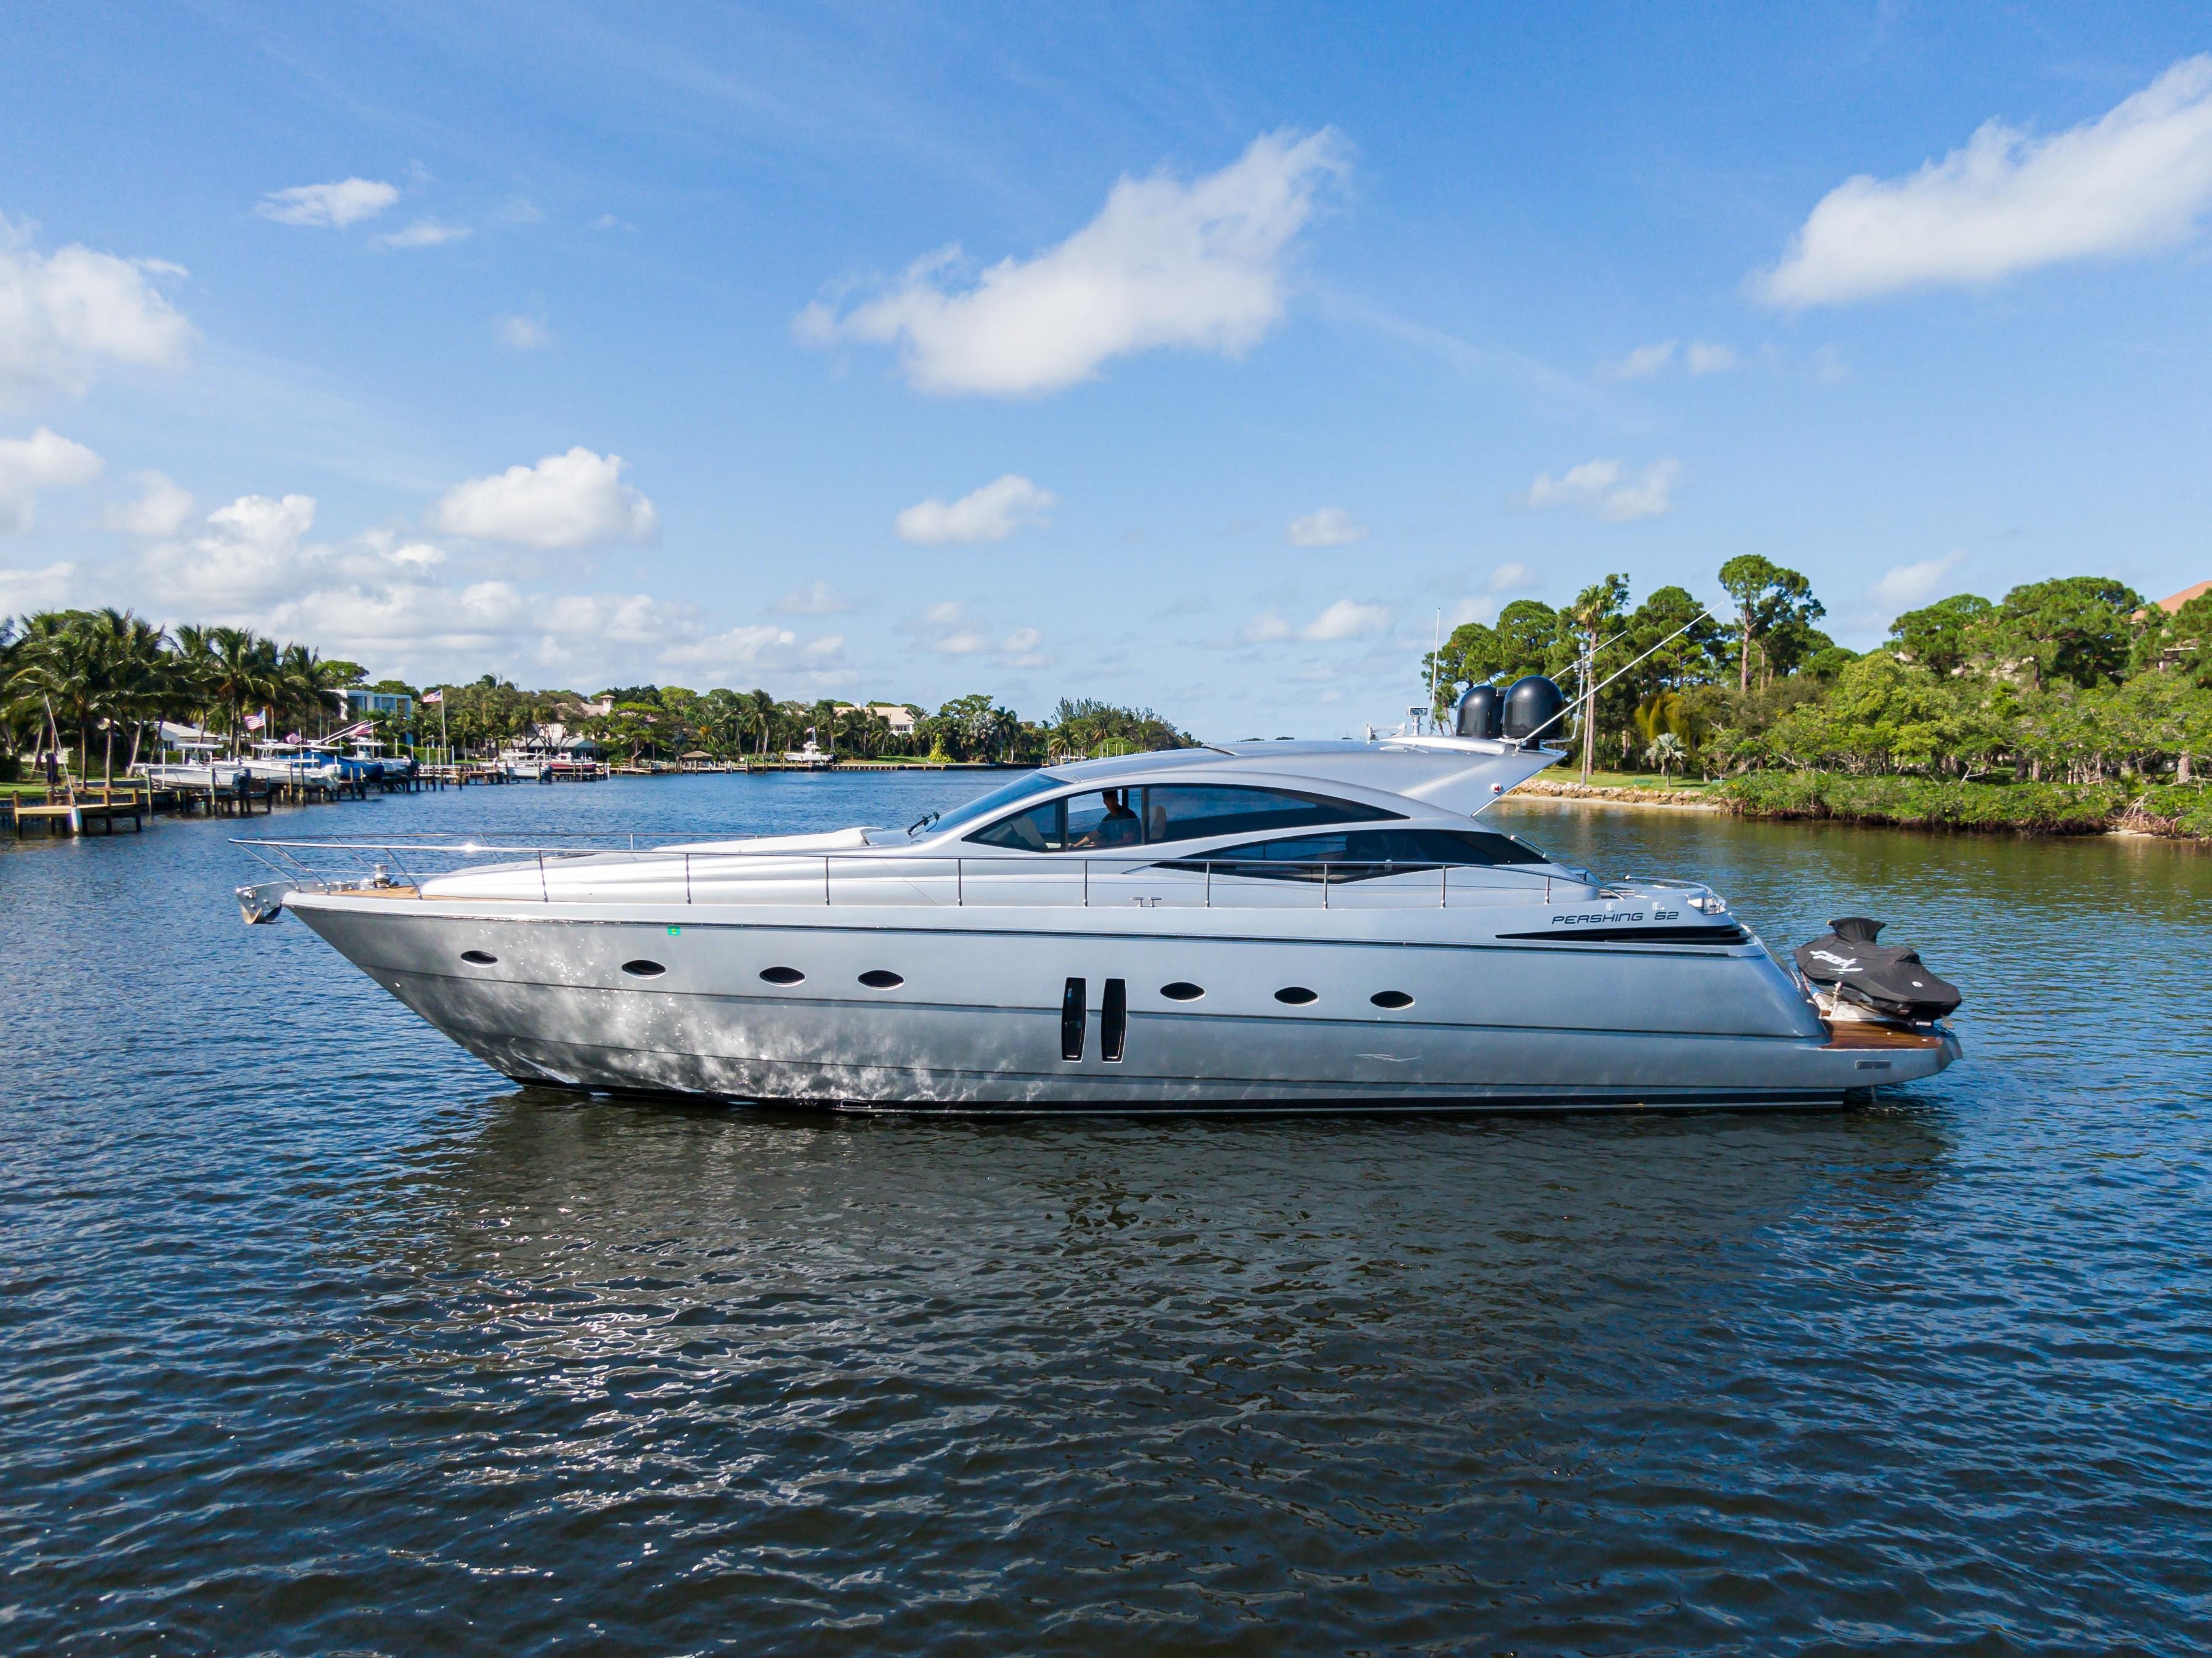 62 ft Pershing Yacht